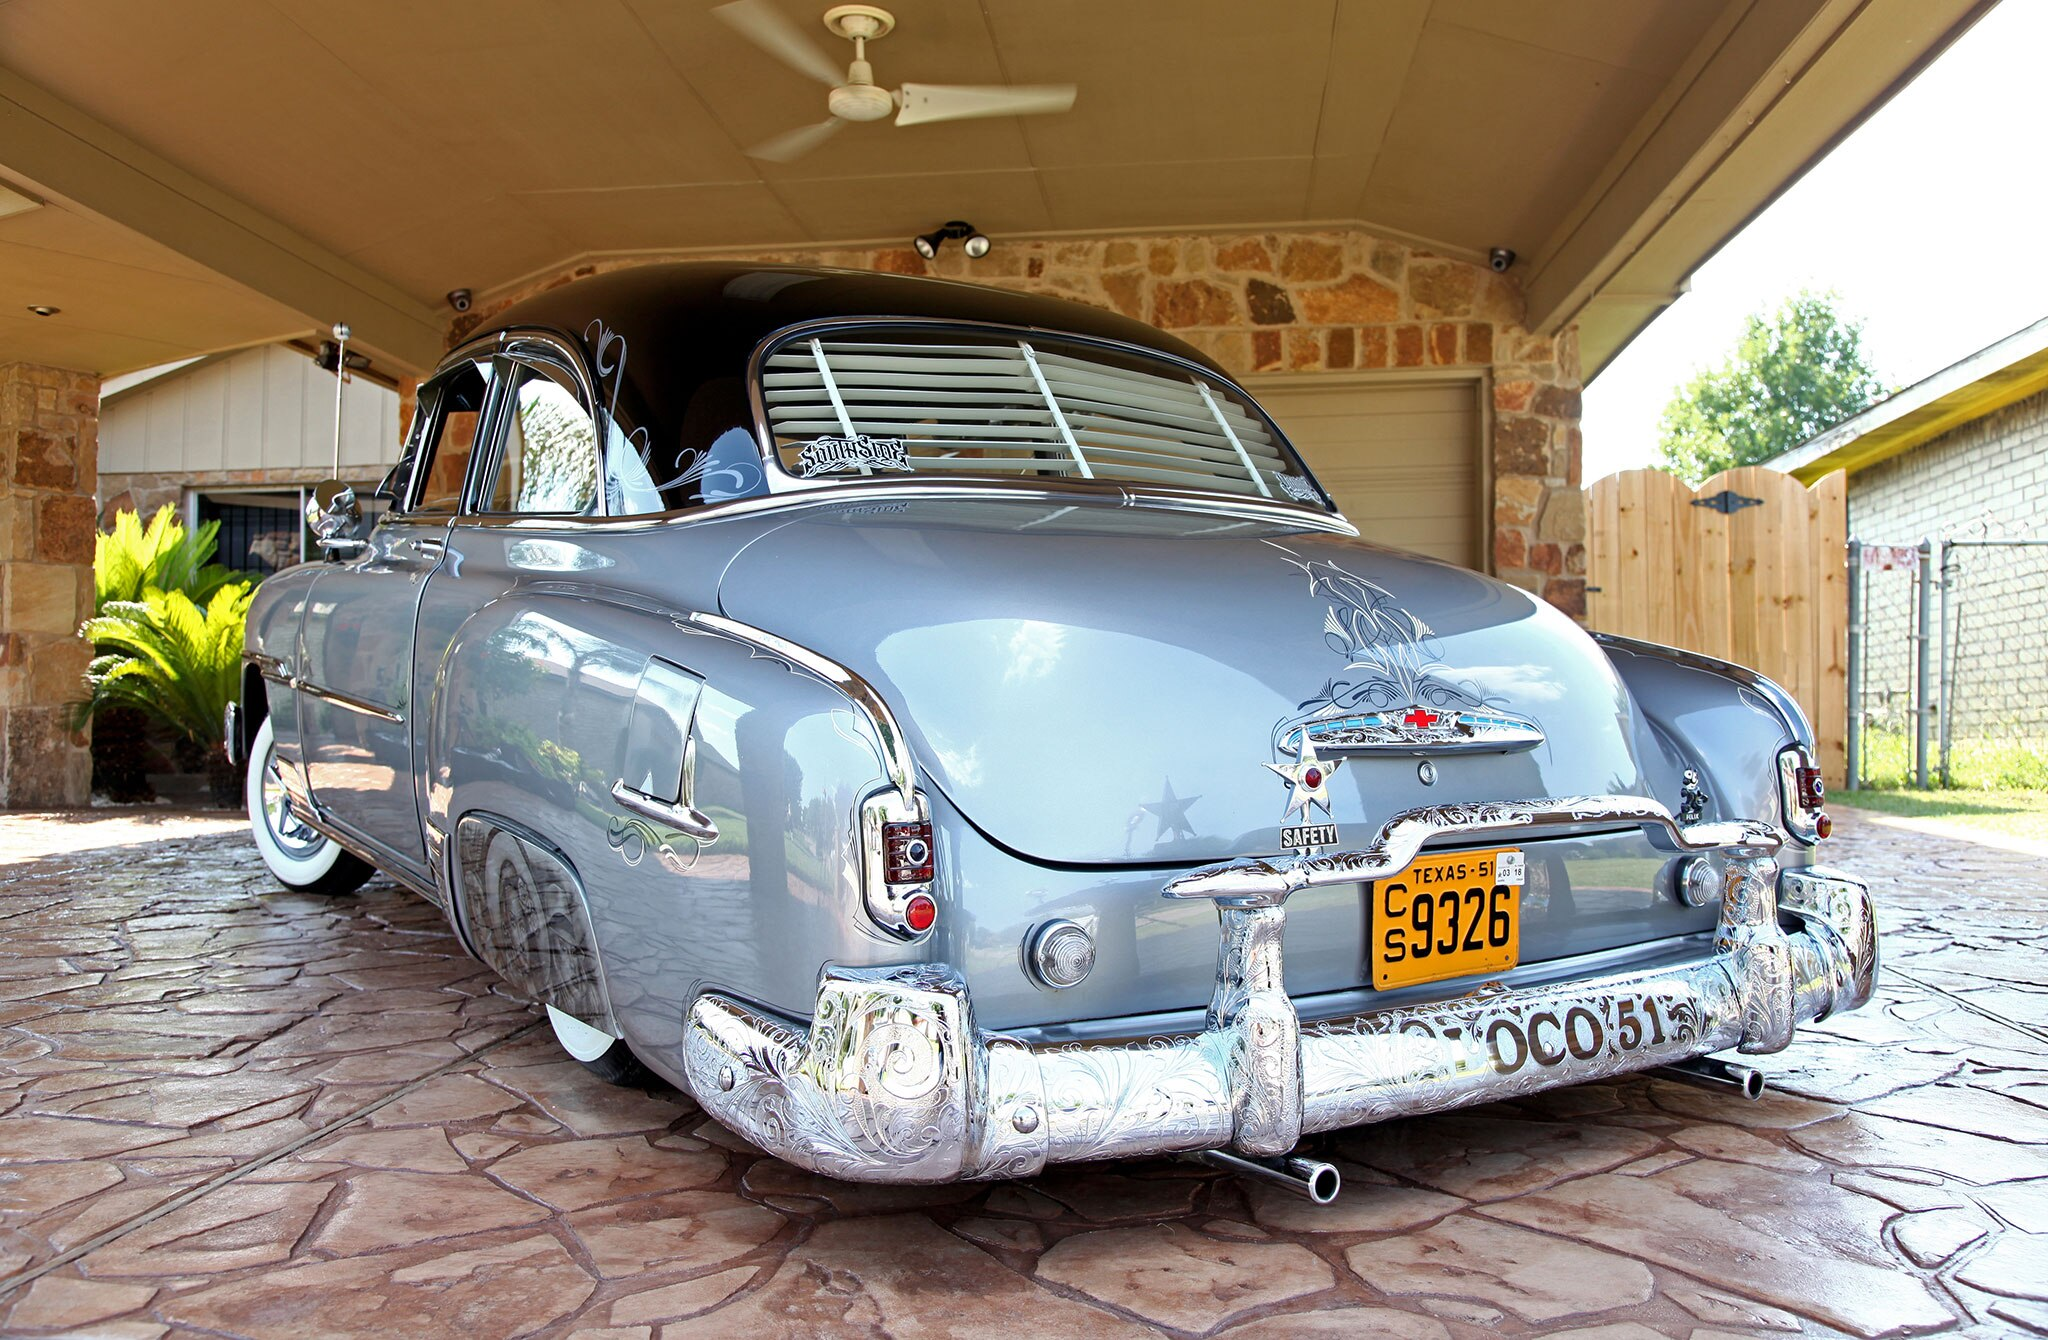 1951-chevrolet-deluxe-rear-bumper-122